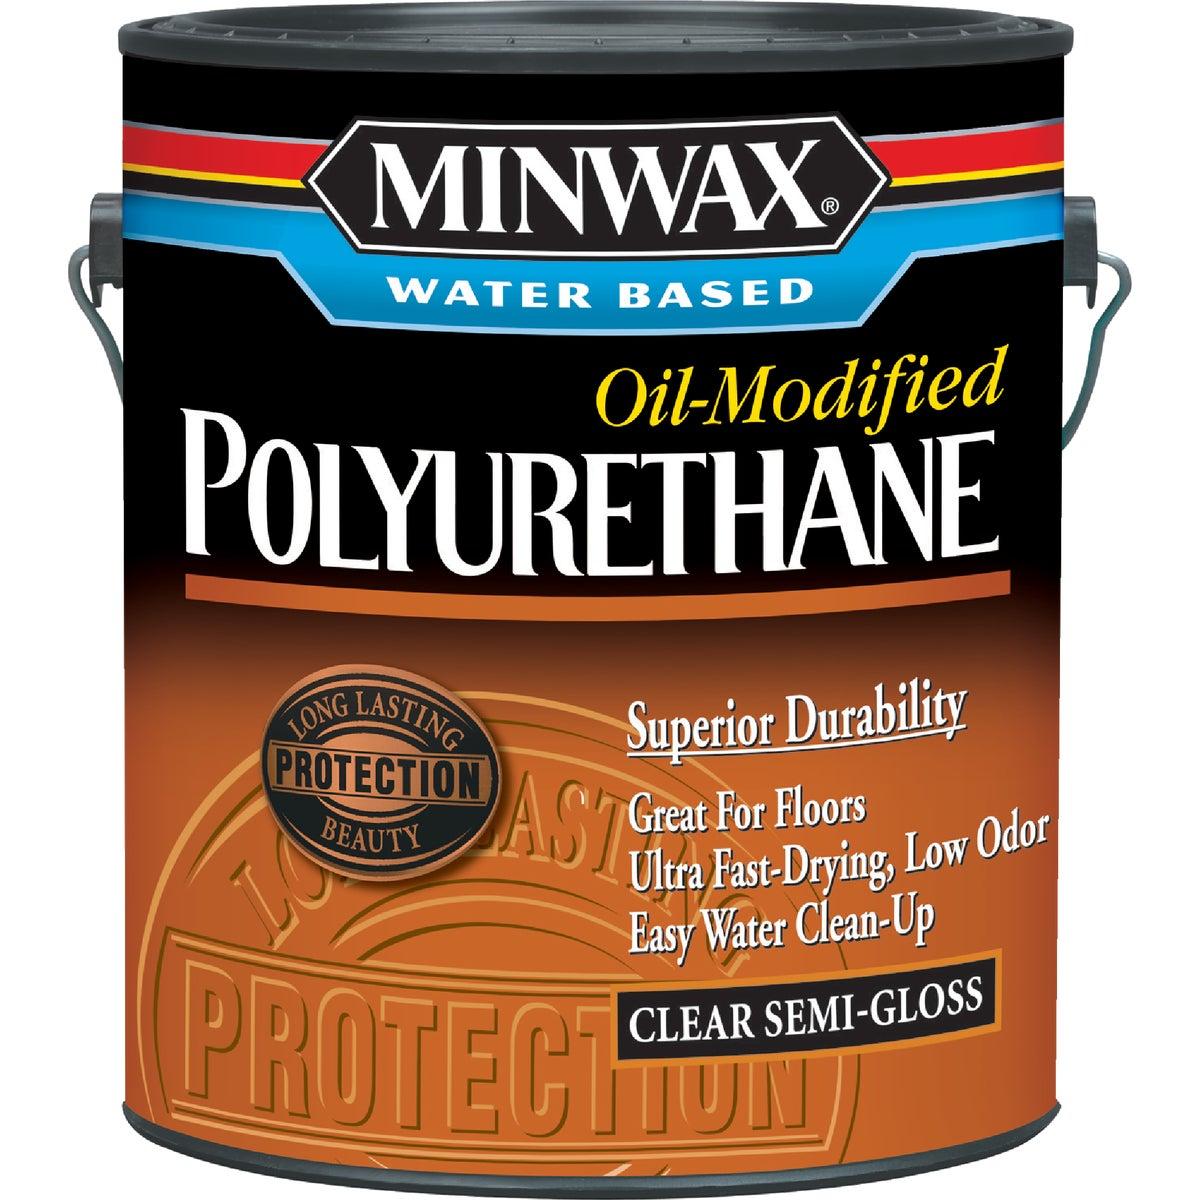 INT W/B S/G POLYURETHANE - 710320000 by Minwax Company